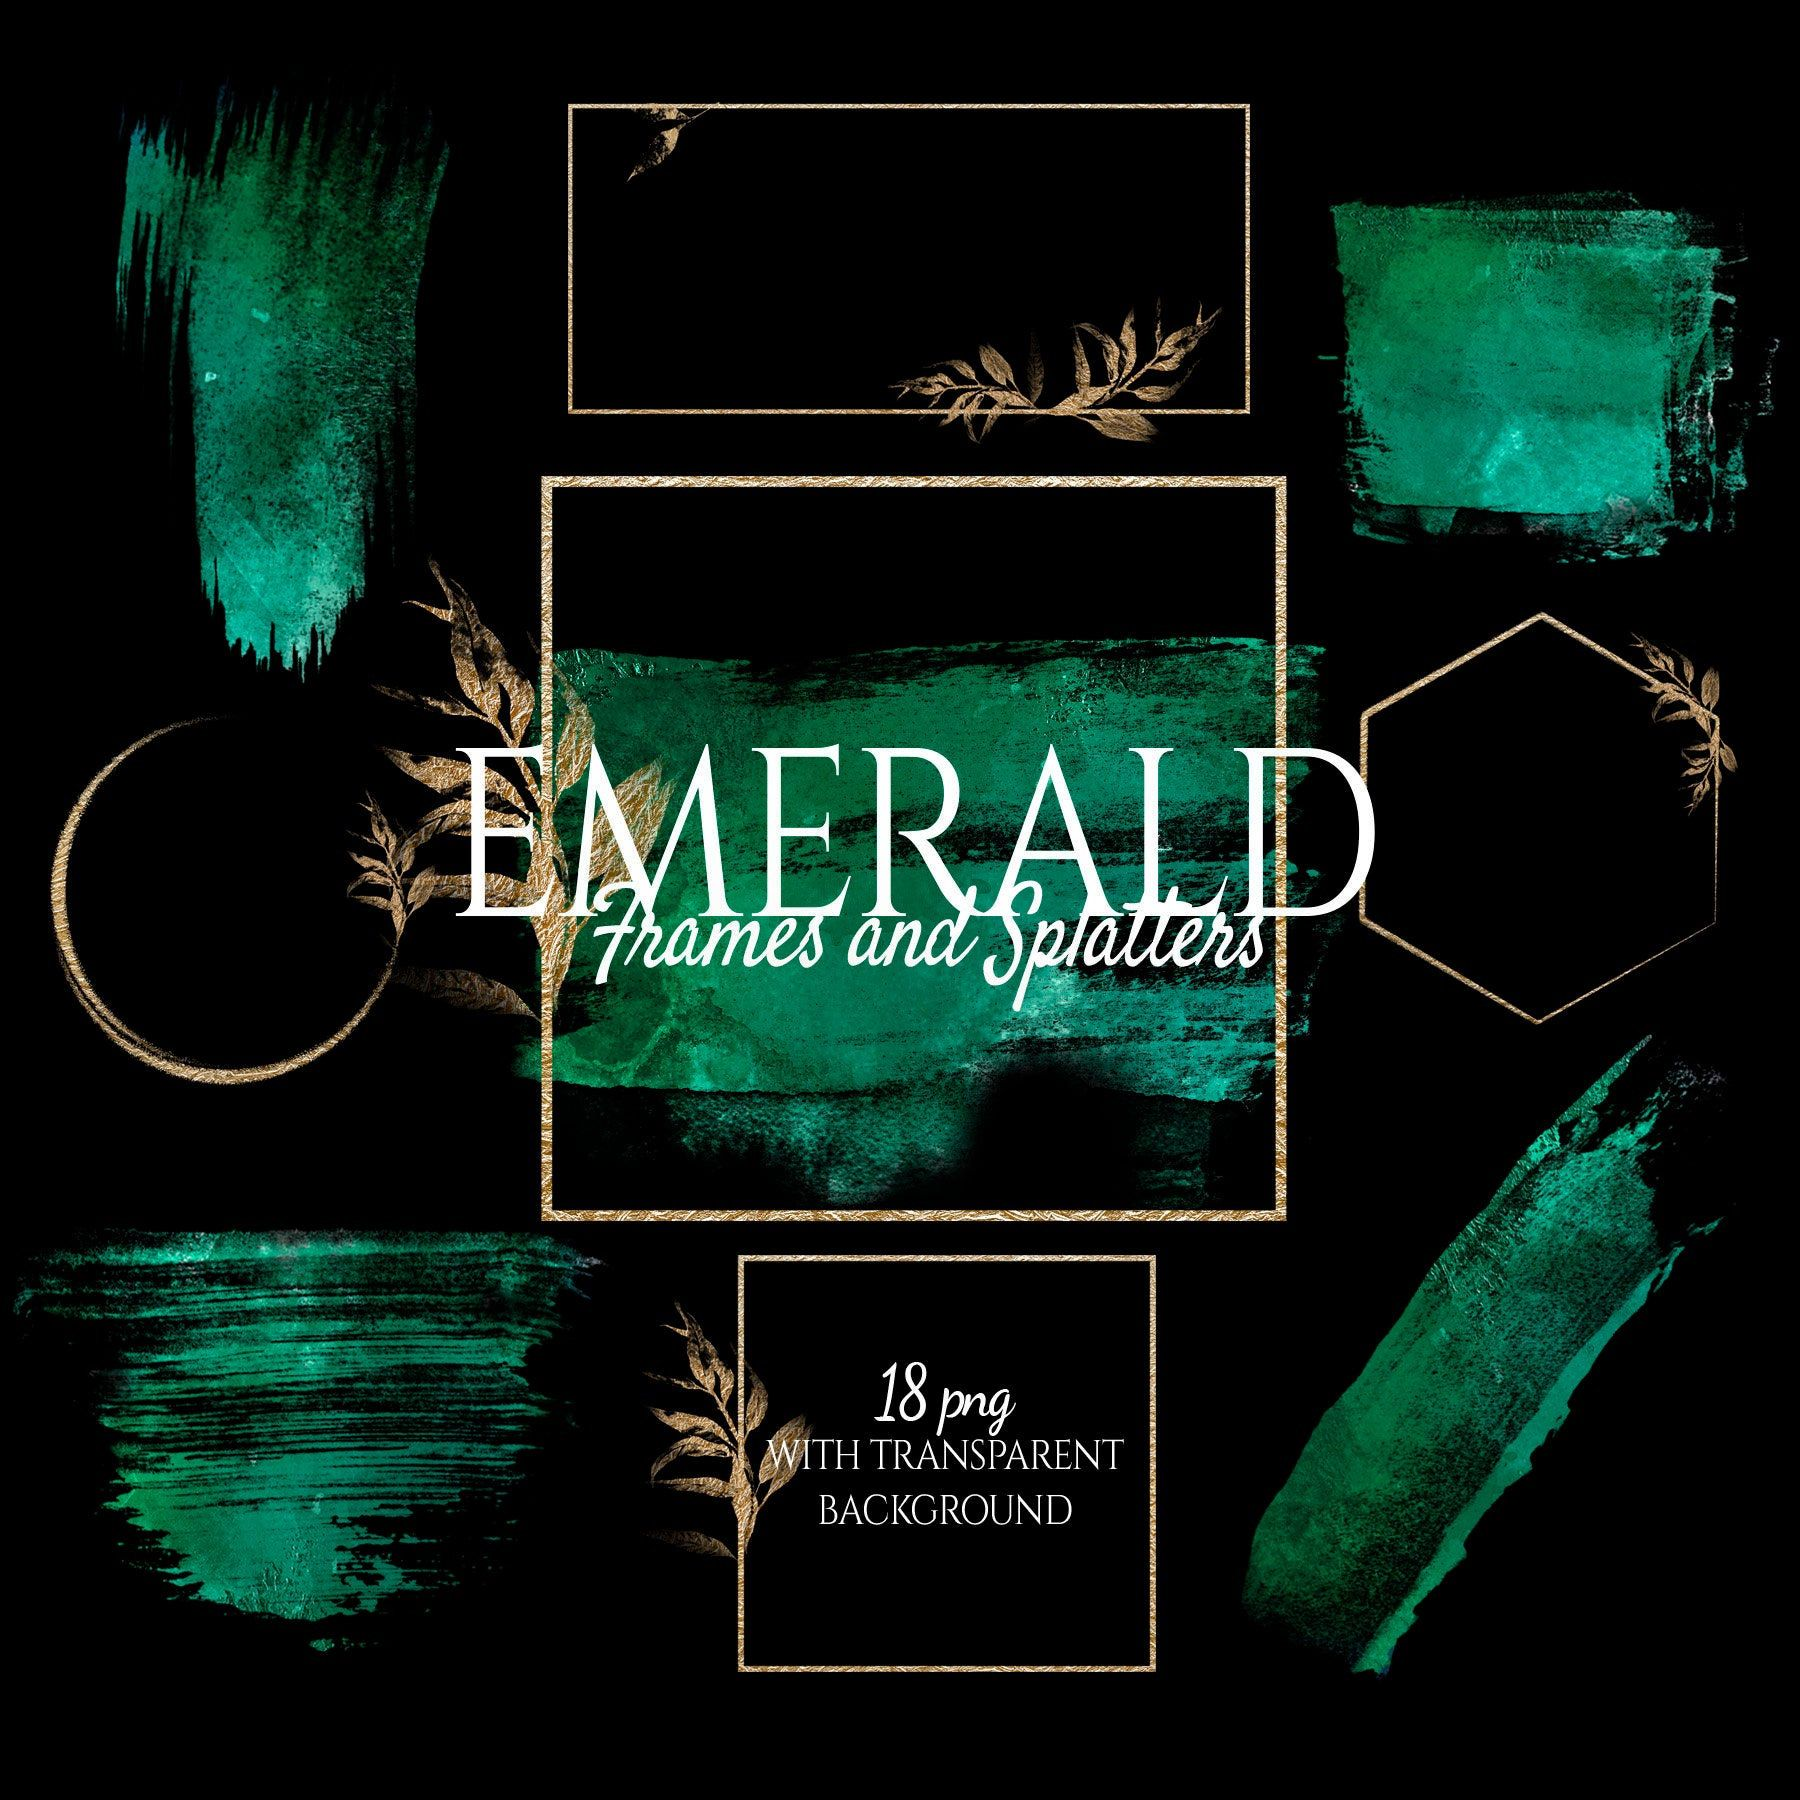 Emerald Watercolor Brush Strokes in Gold Foil Frames, Gold